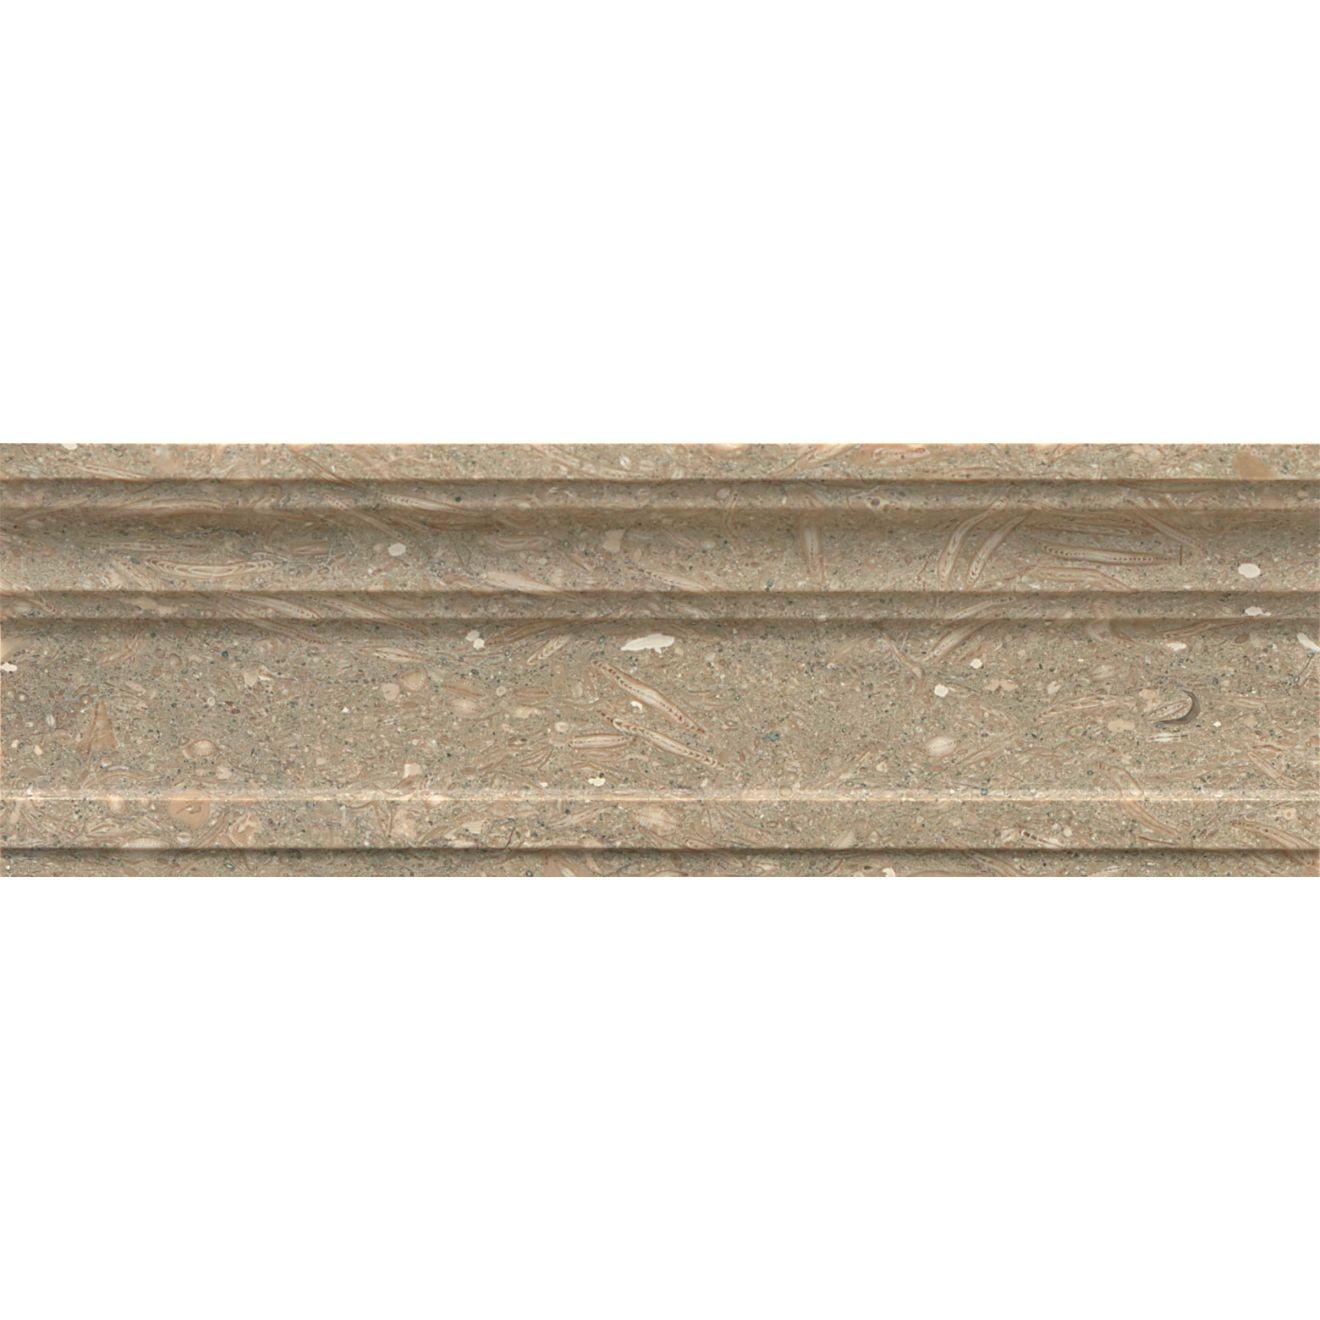 4X12 Modrock Base Crown-Tepenade